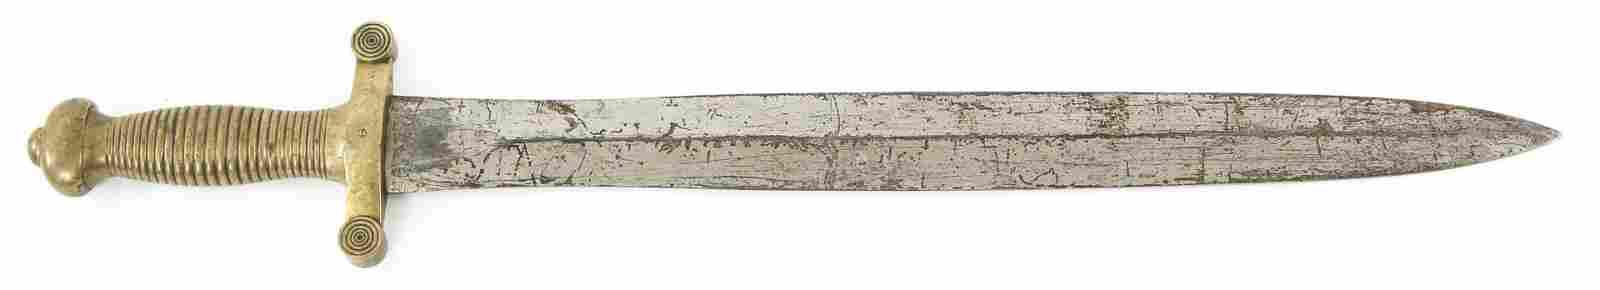 FRENCH MODEL 1831 FOOT ARTILLERY SWORD